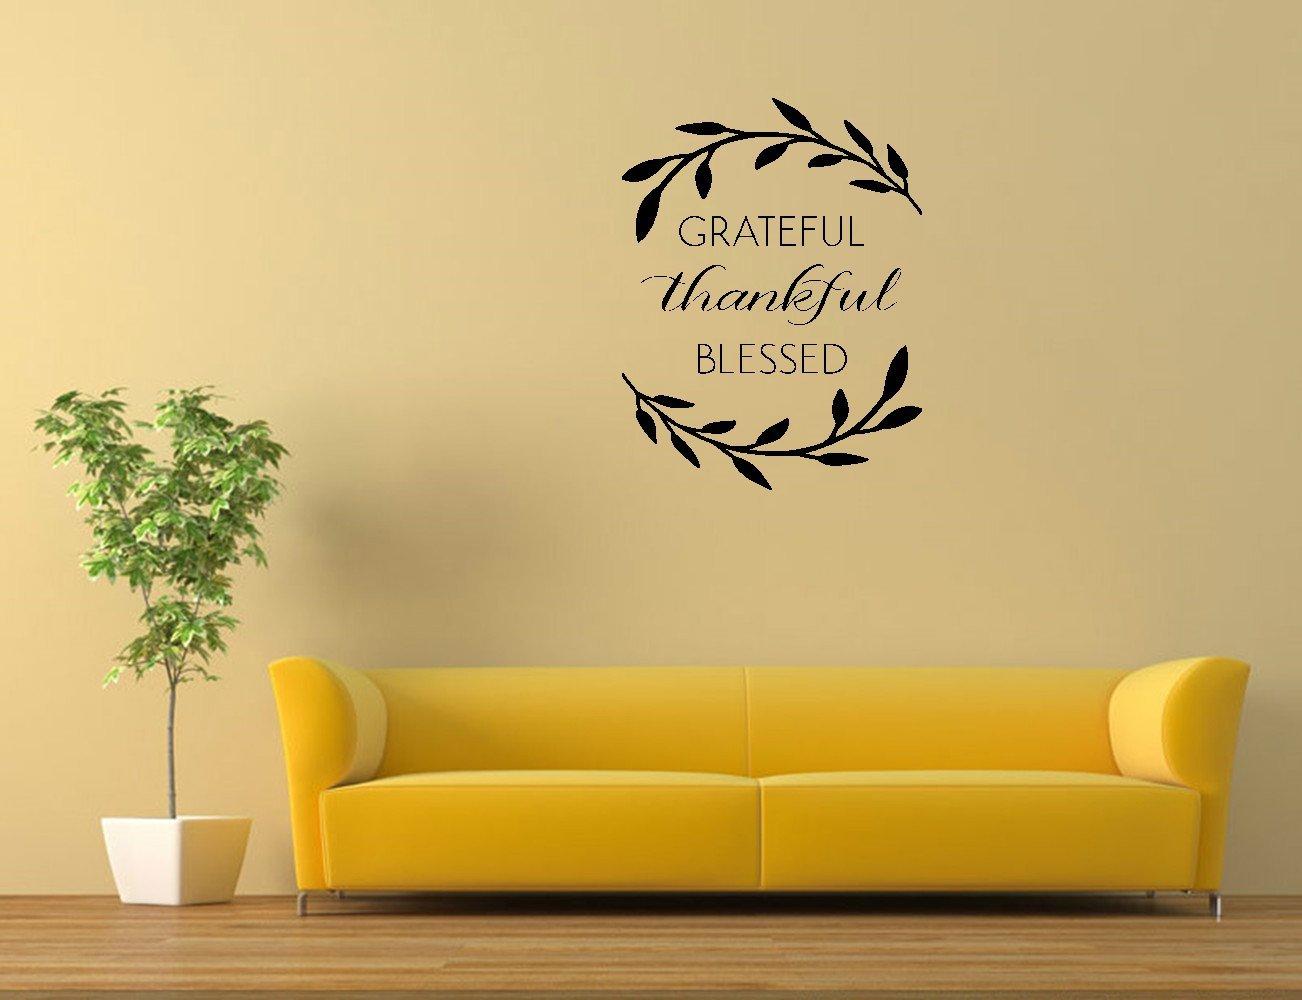 Amazon.com: fghhtf Grateful Thankful Blessed (leaves) Vinyl Wall ...